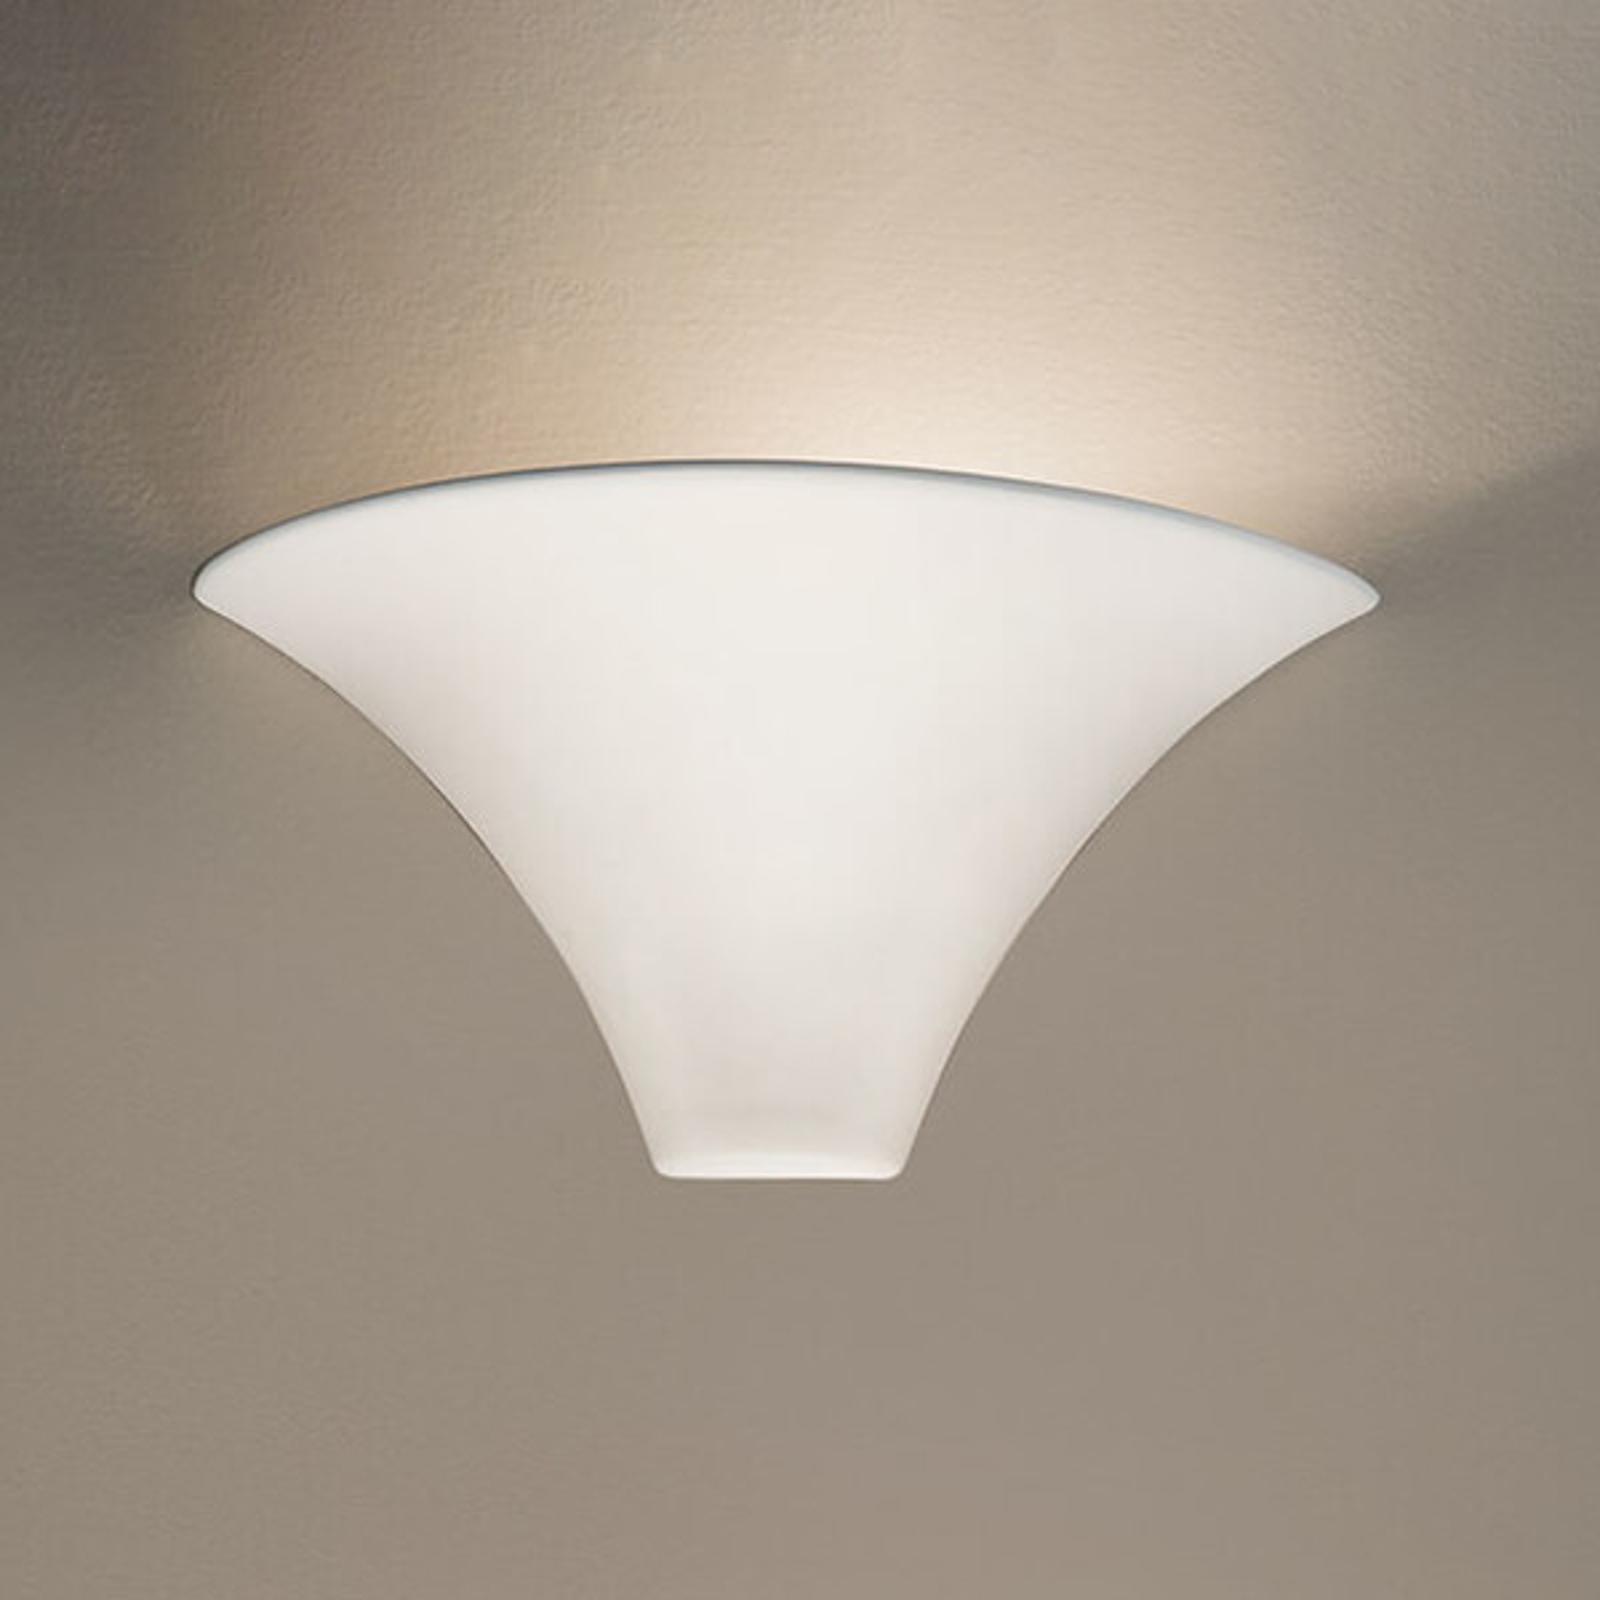 Statig witte wandlamp CARDIN